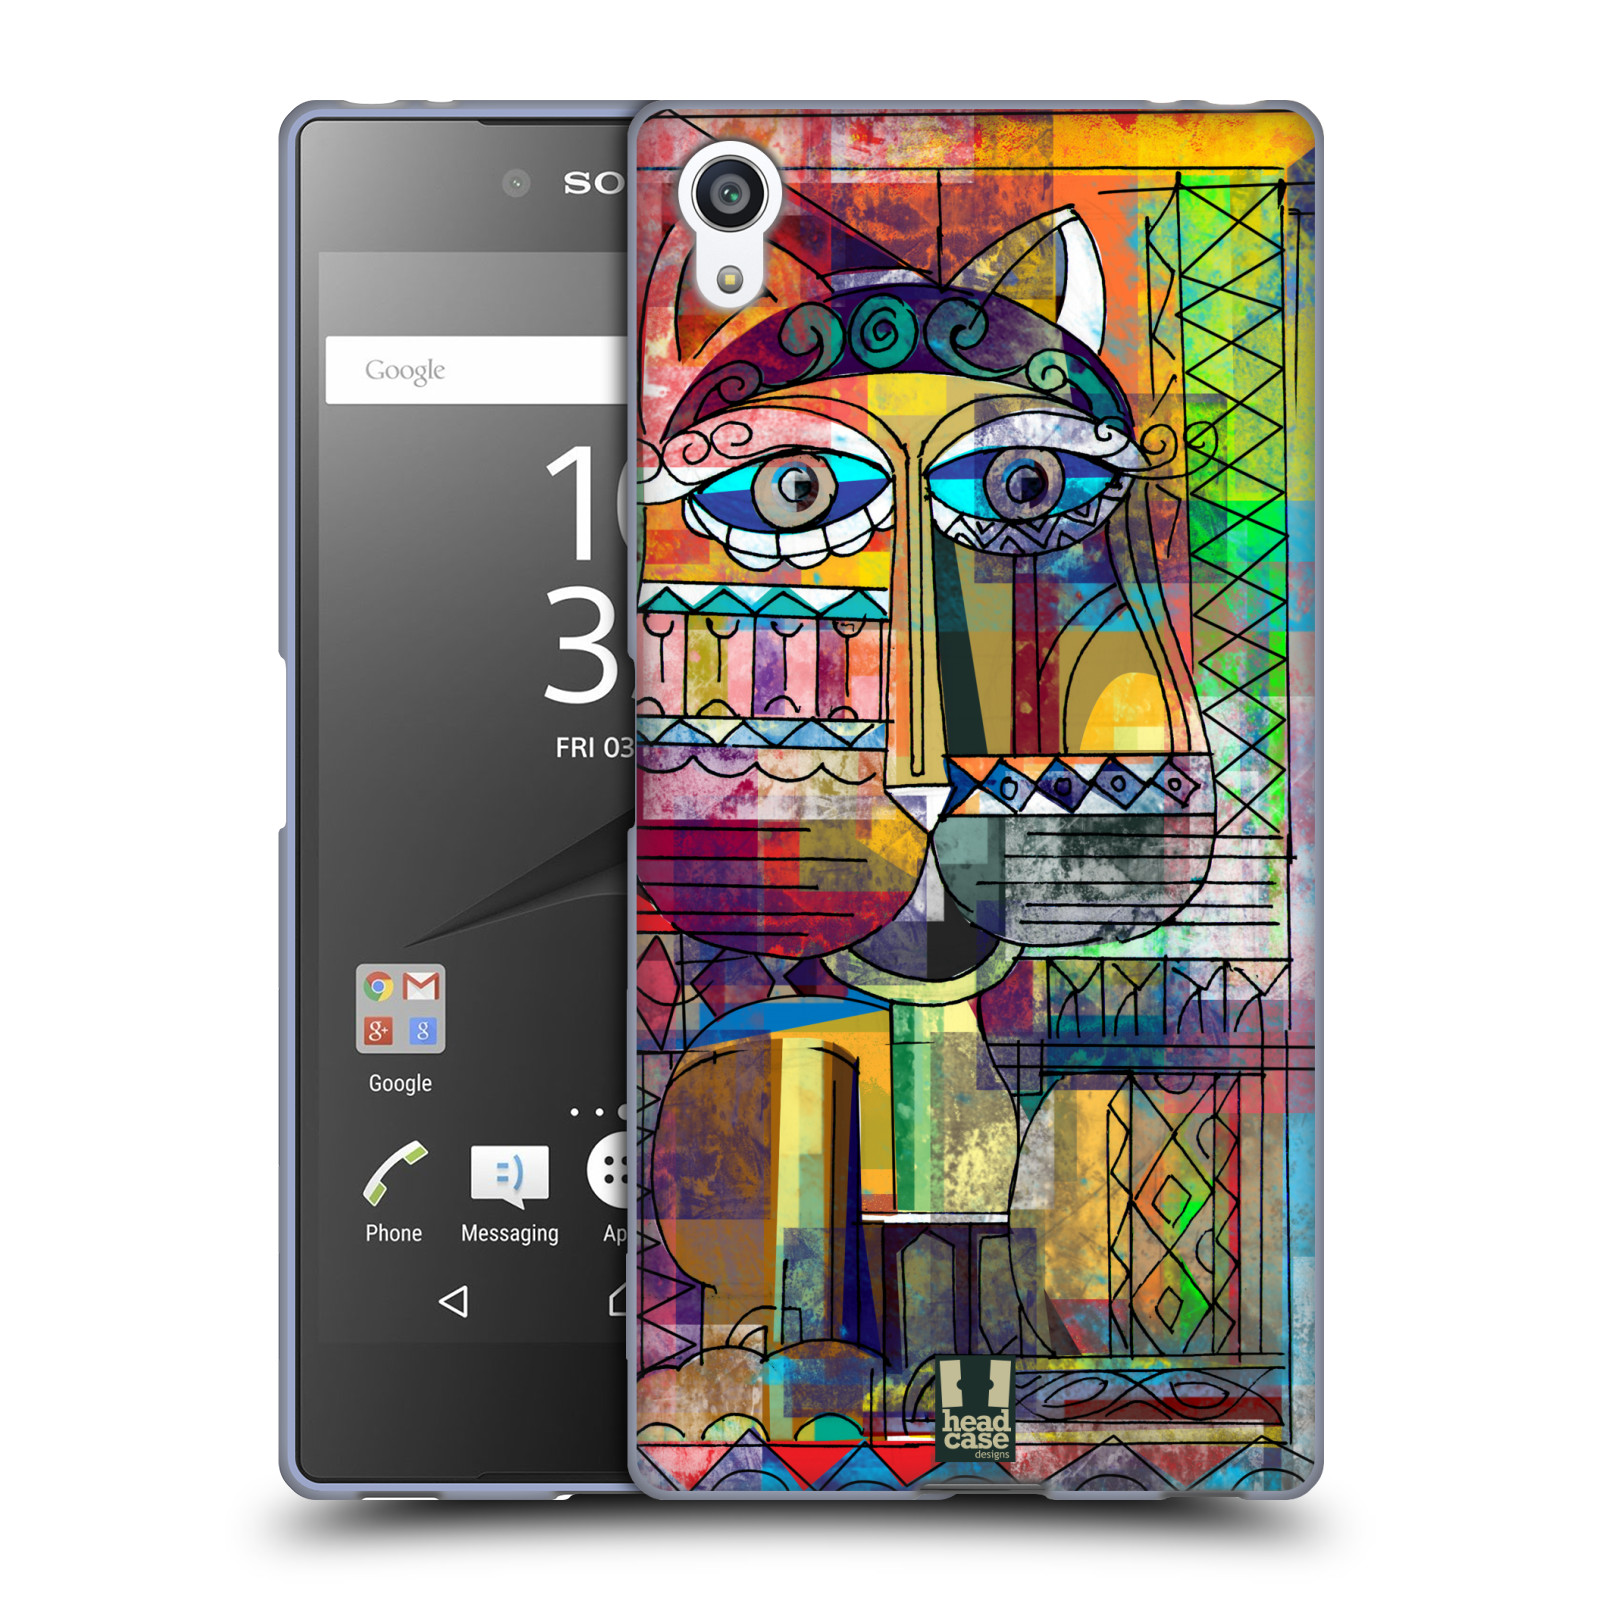 Silikonové pouzdro na mobil Sony Xperia Z5 Premium HEAD CASE AZTEC KORAT